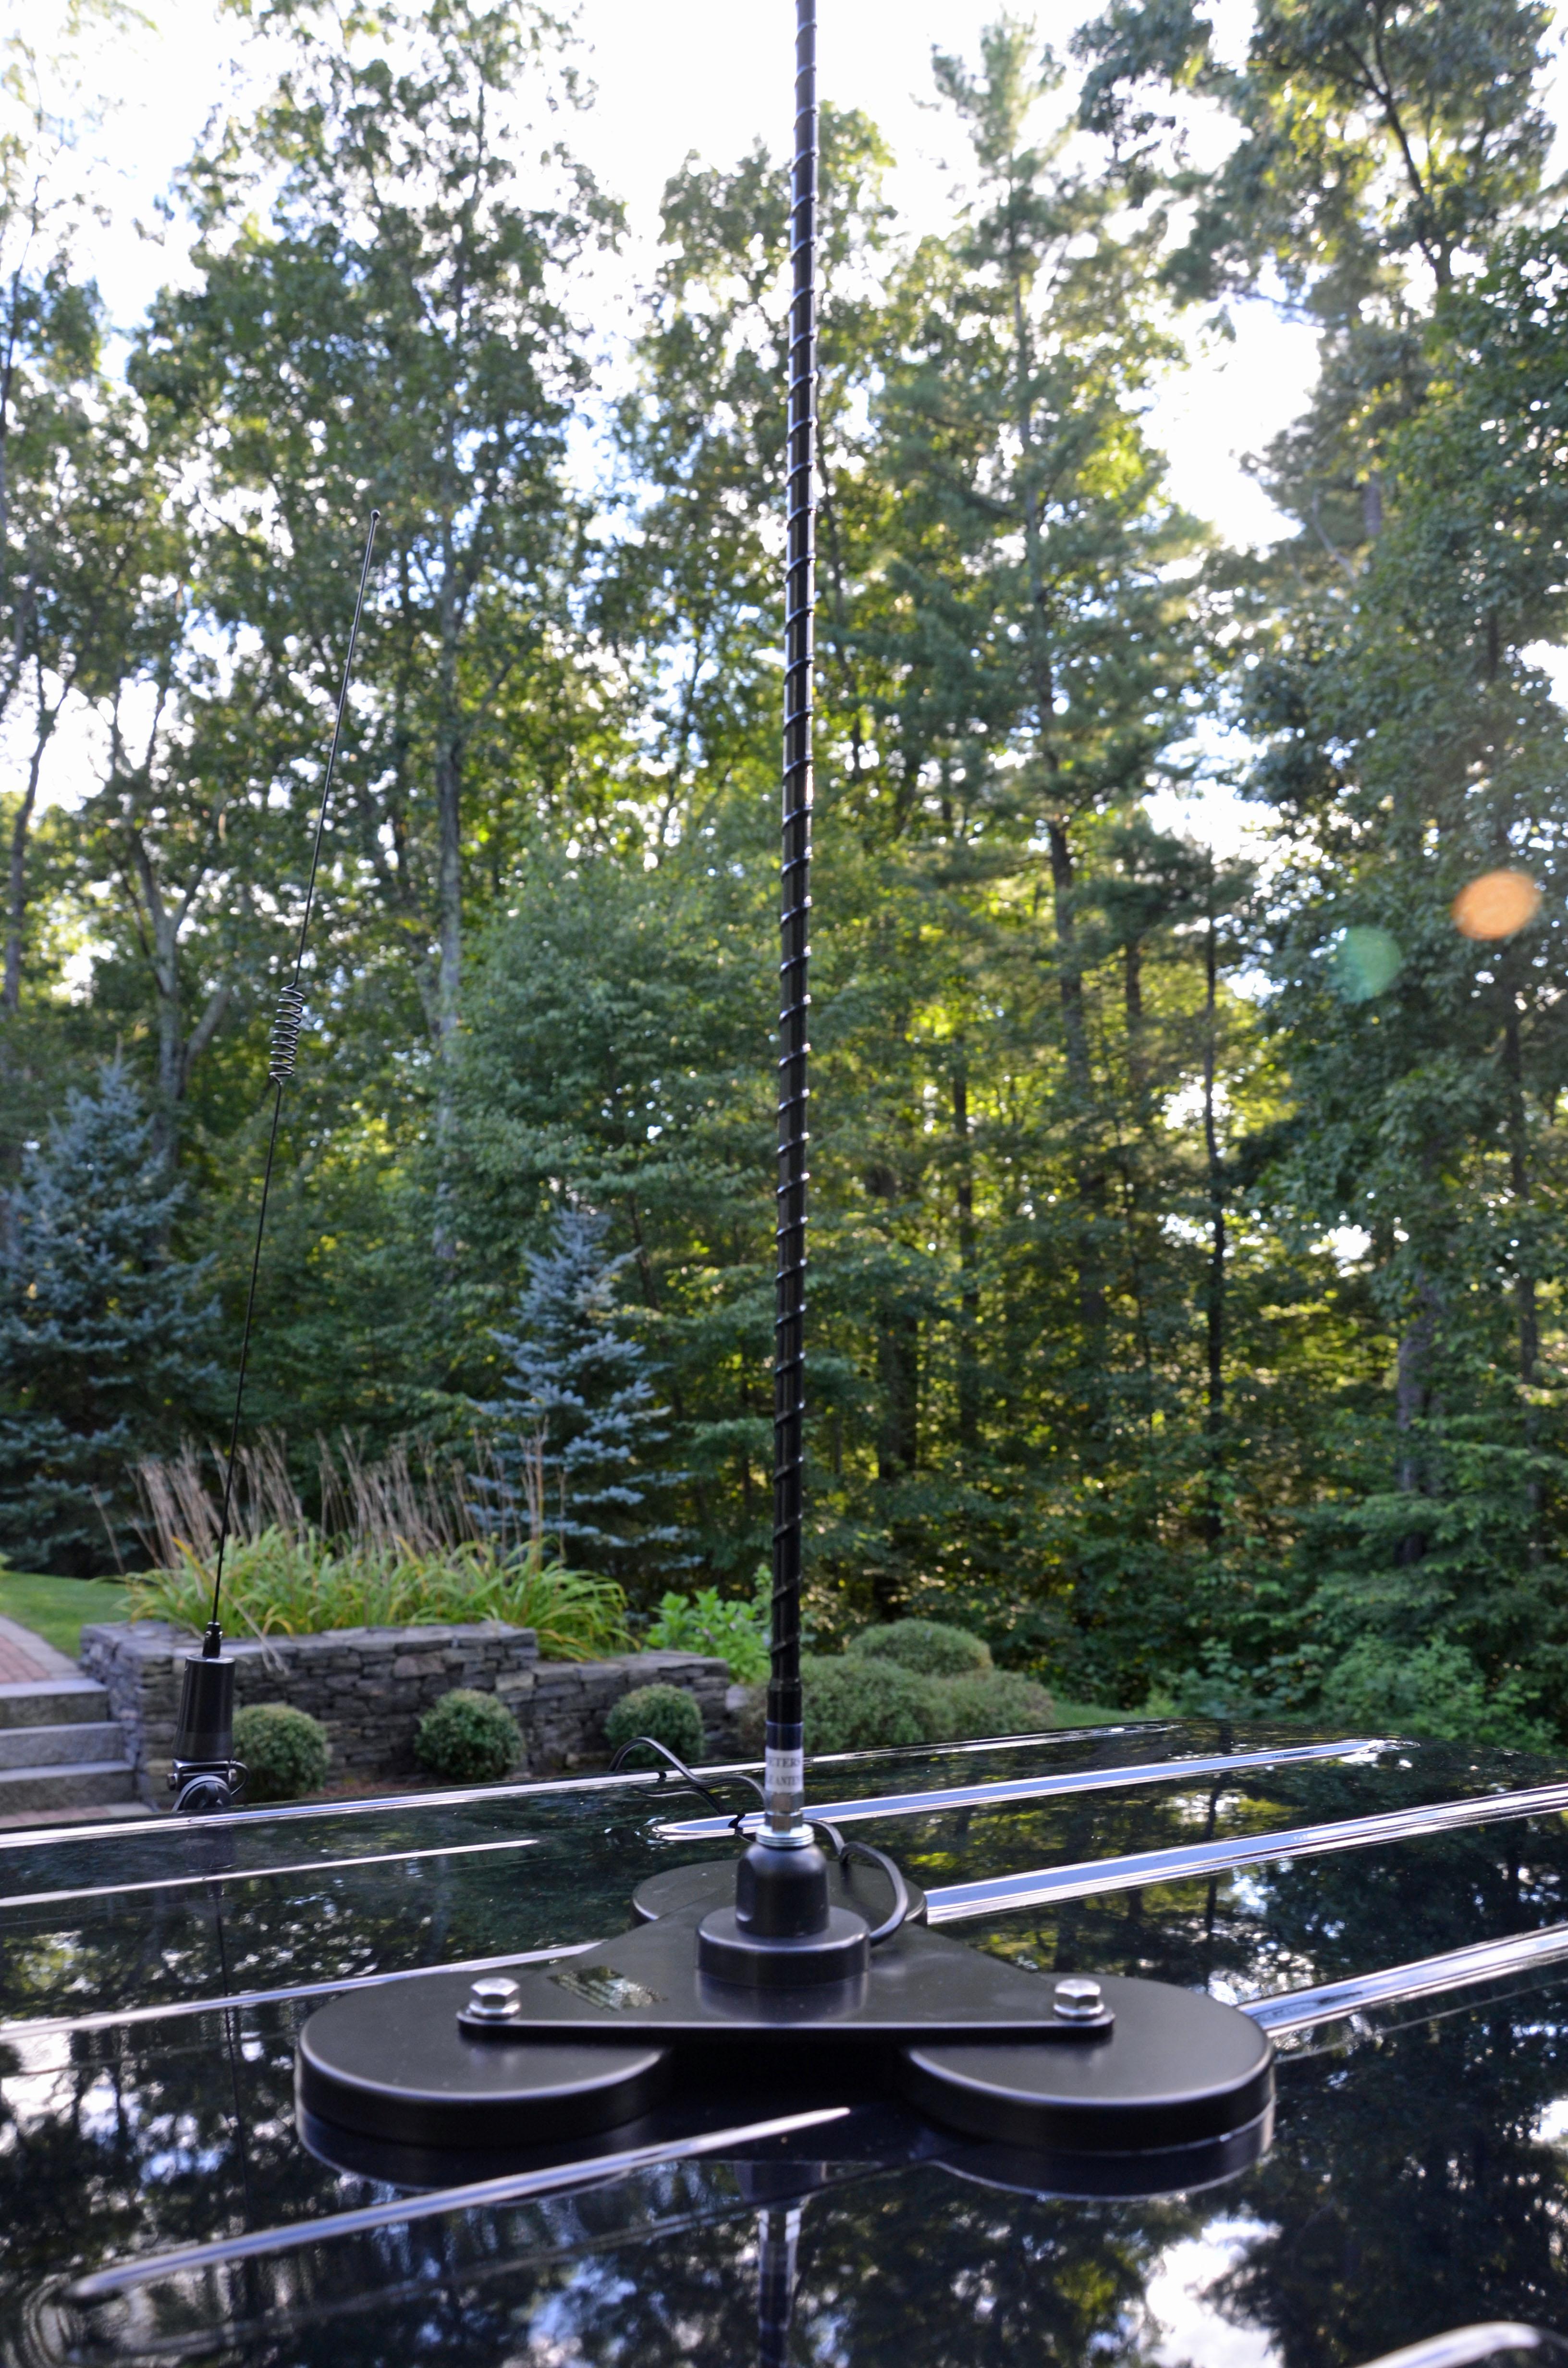 Need help/advice on HF Ham radio antenna portable and base